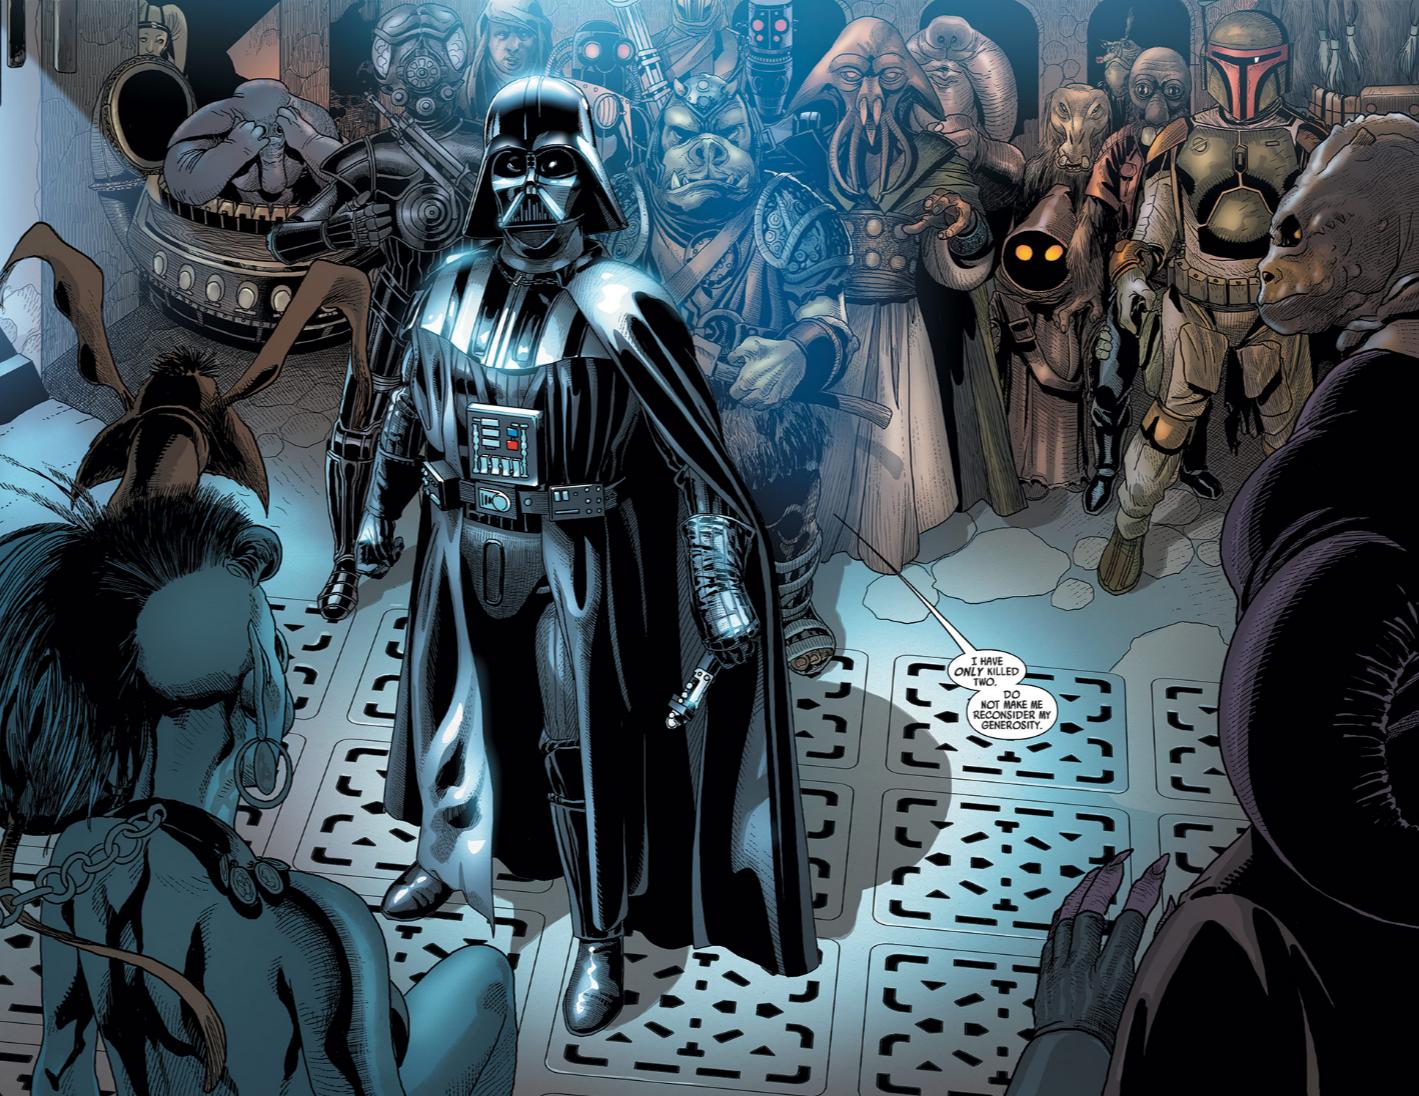 Darth Vader 2015 1 Star Wars Comics Darth Vader Comic Star Wars Art